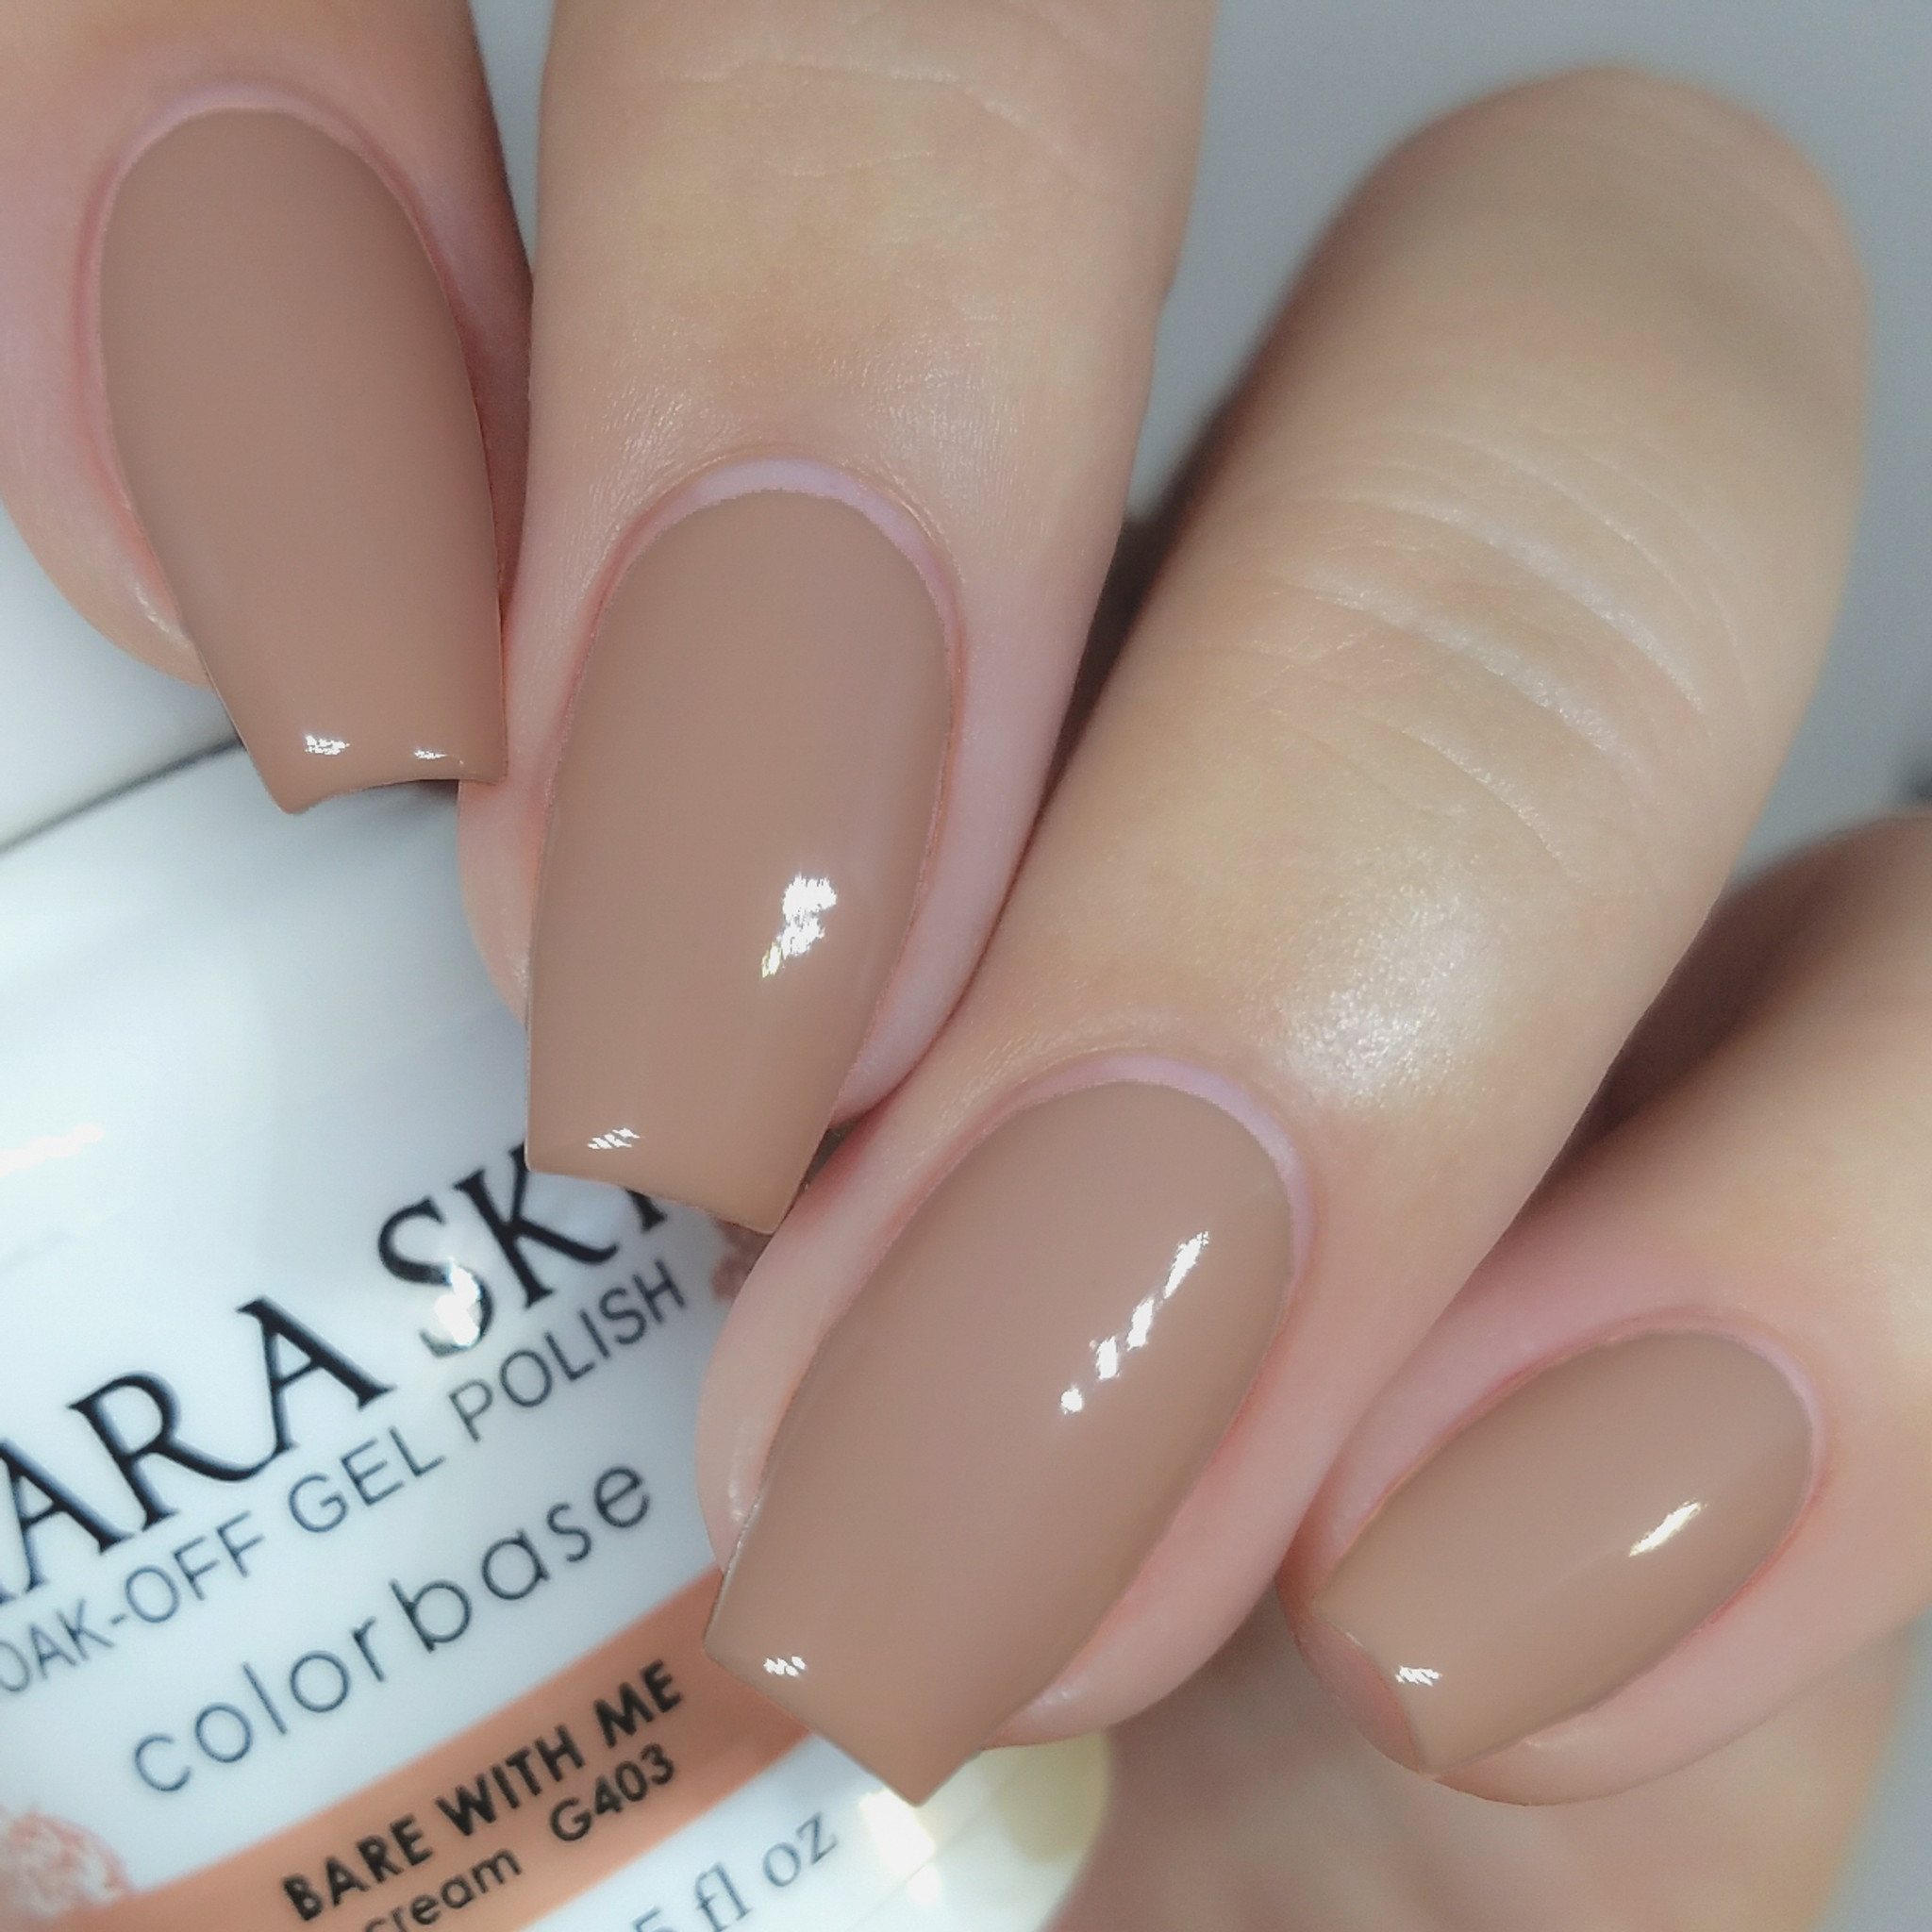 Nude Gel Polish | Beige Gel Nail Polish | Kiara Sky